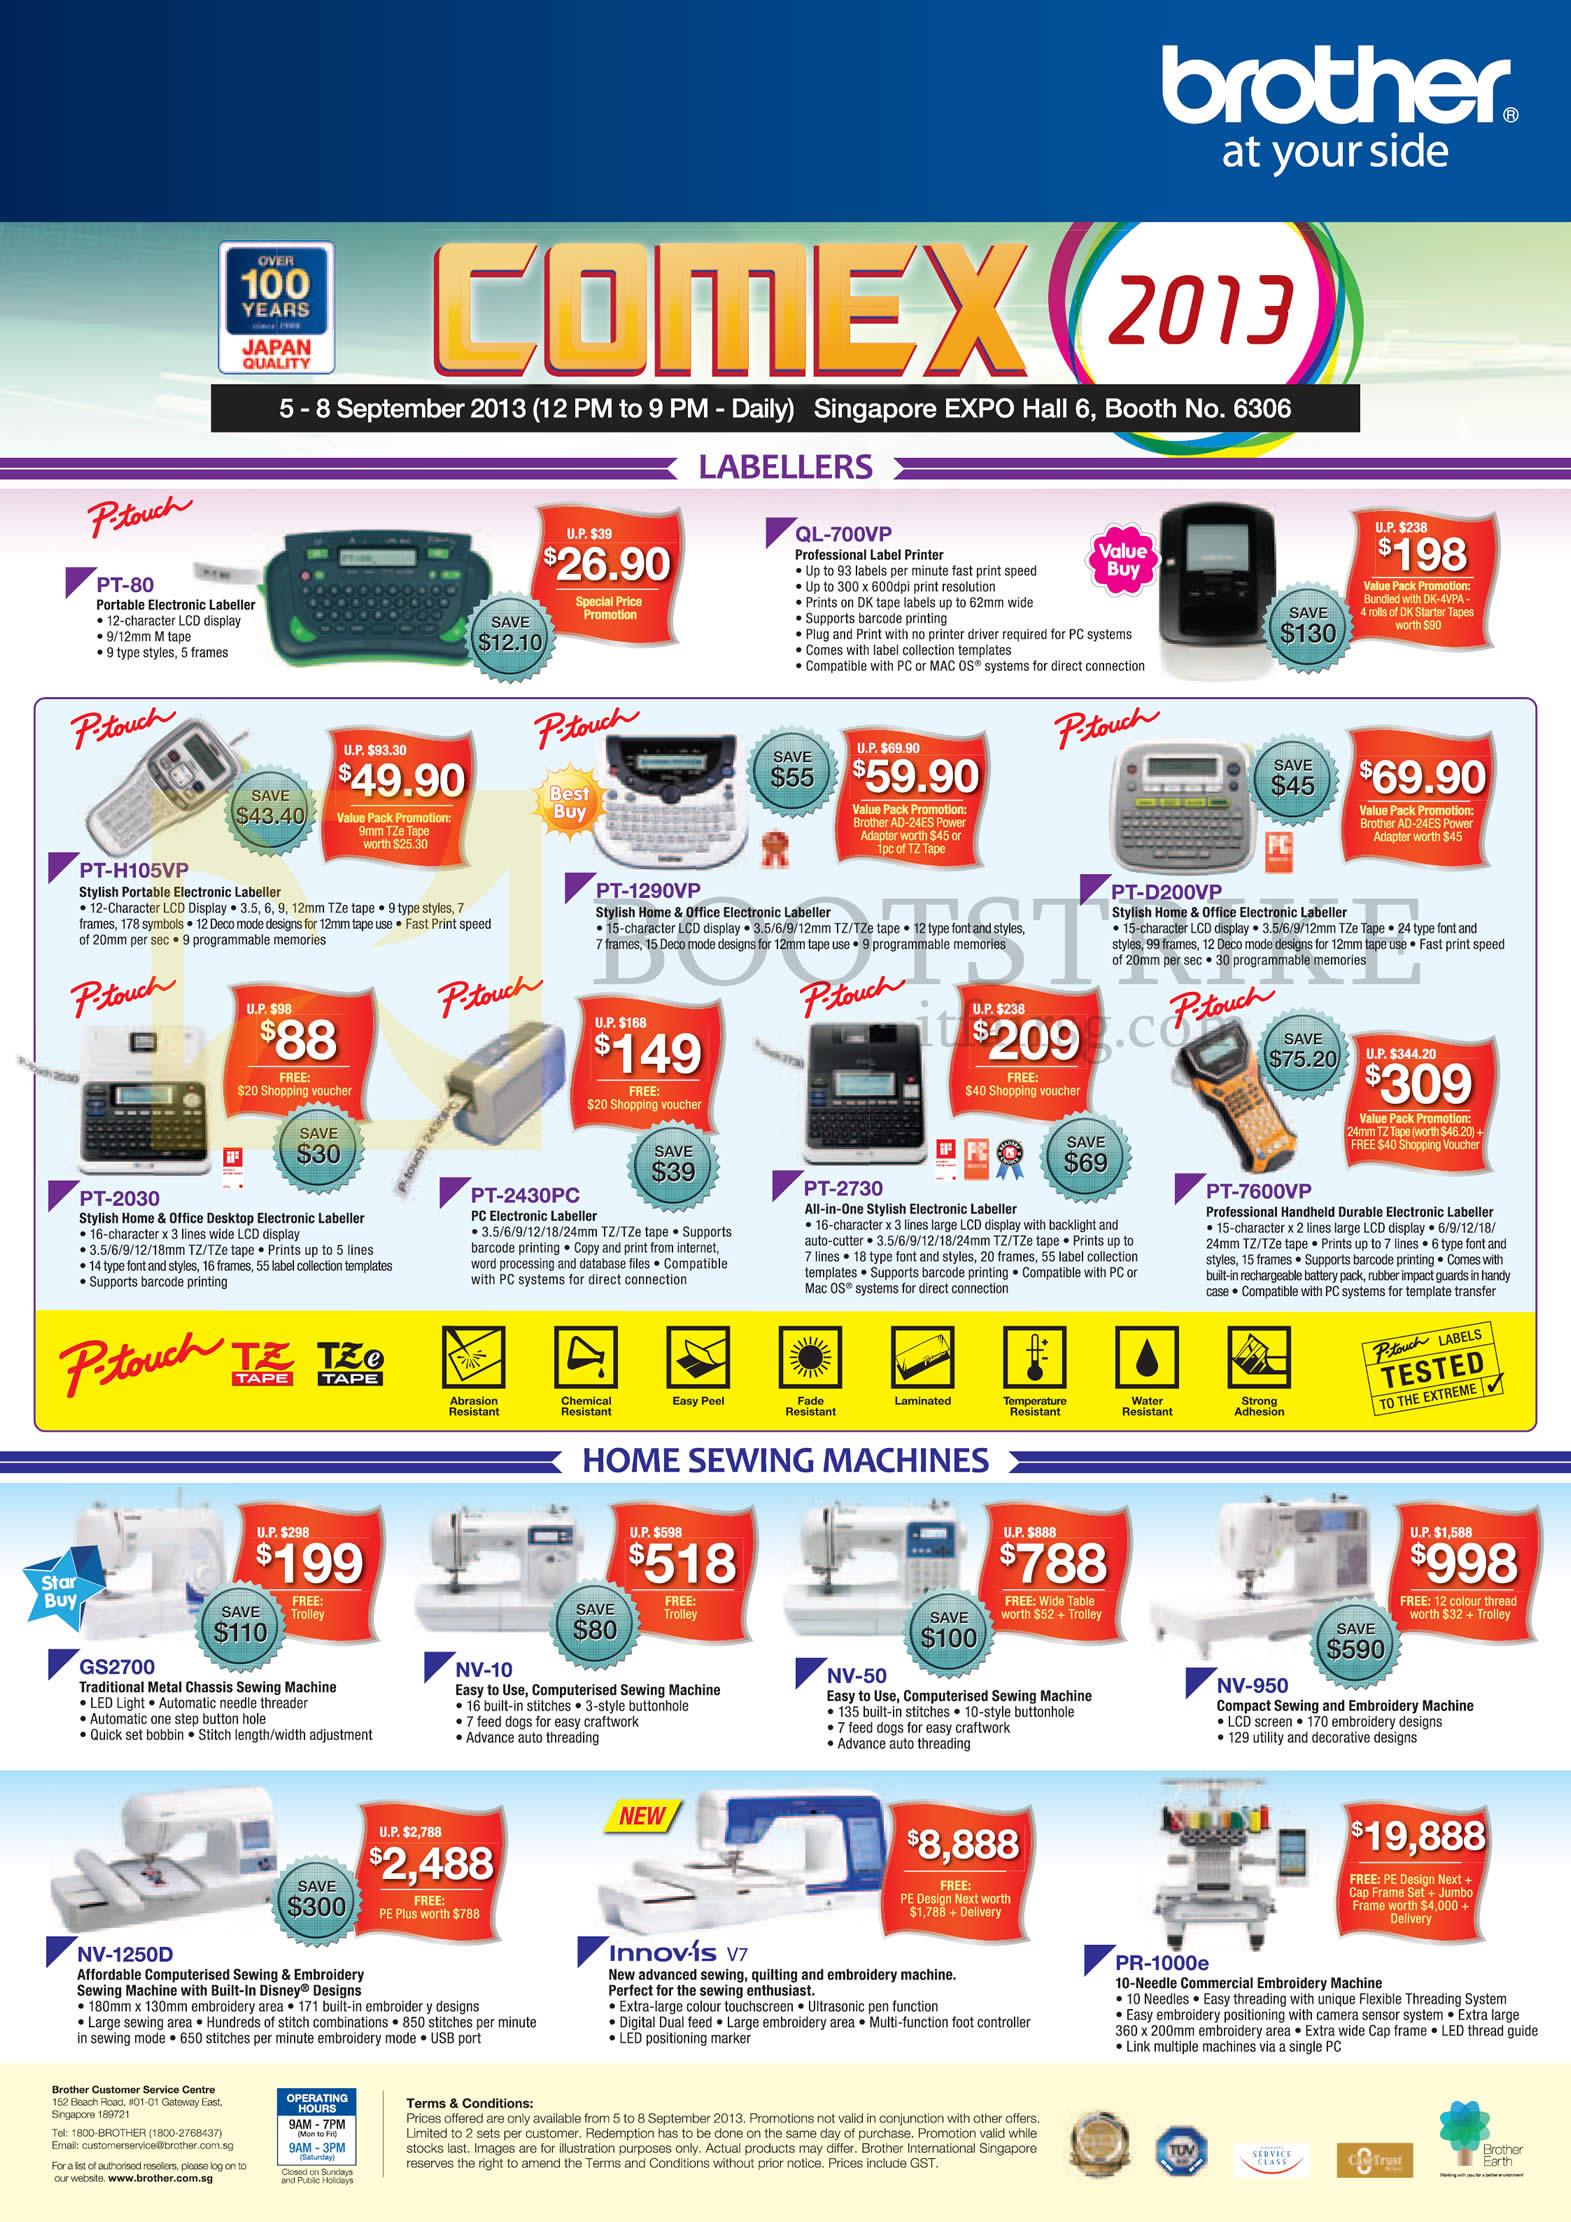 COMEX 2013 price list image brochure of Brother Labellers P-Touch QL-700VP PT-80 H105VP 1290VP D200VP 2030 2430PC 2730 7600VP, Sewing Machines GS2700 NV-10 NV-50 NV-950 NV-1250D INNOVIS V7 PR-1000E